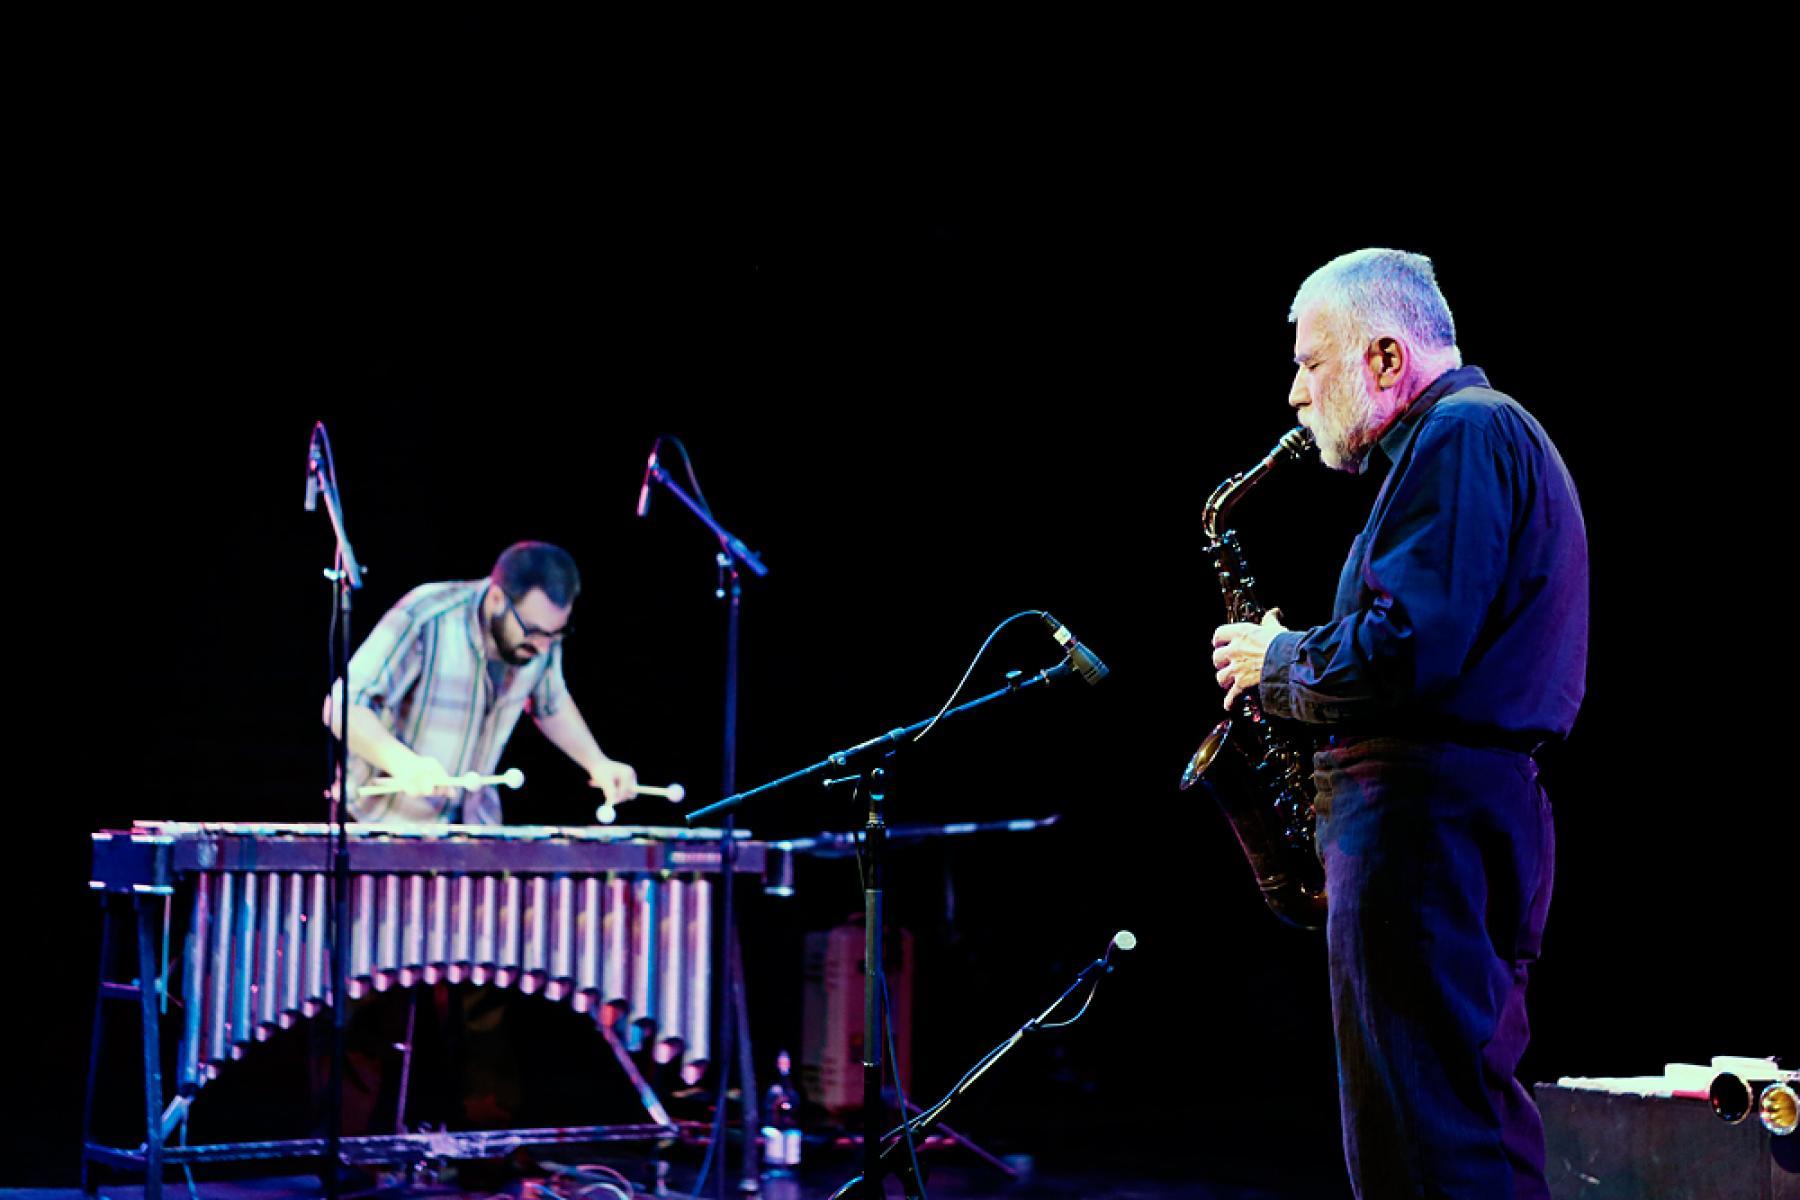 Peter Brötzmann & Jason Adasiewicz, 18 September 2012. Photo by Lesley Brown.